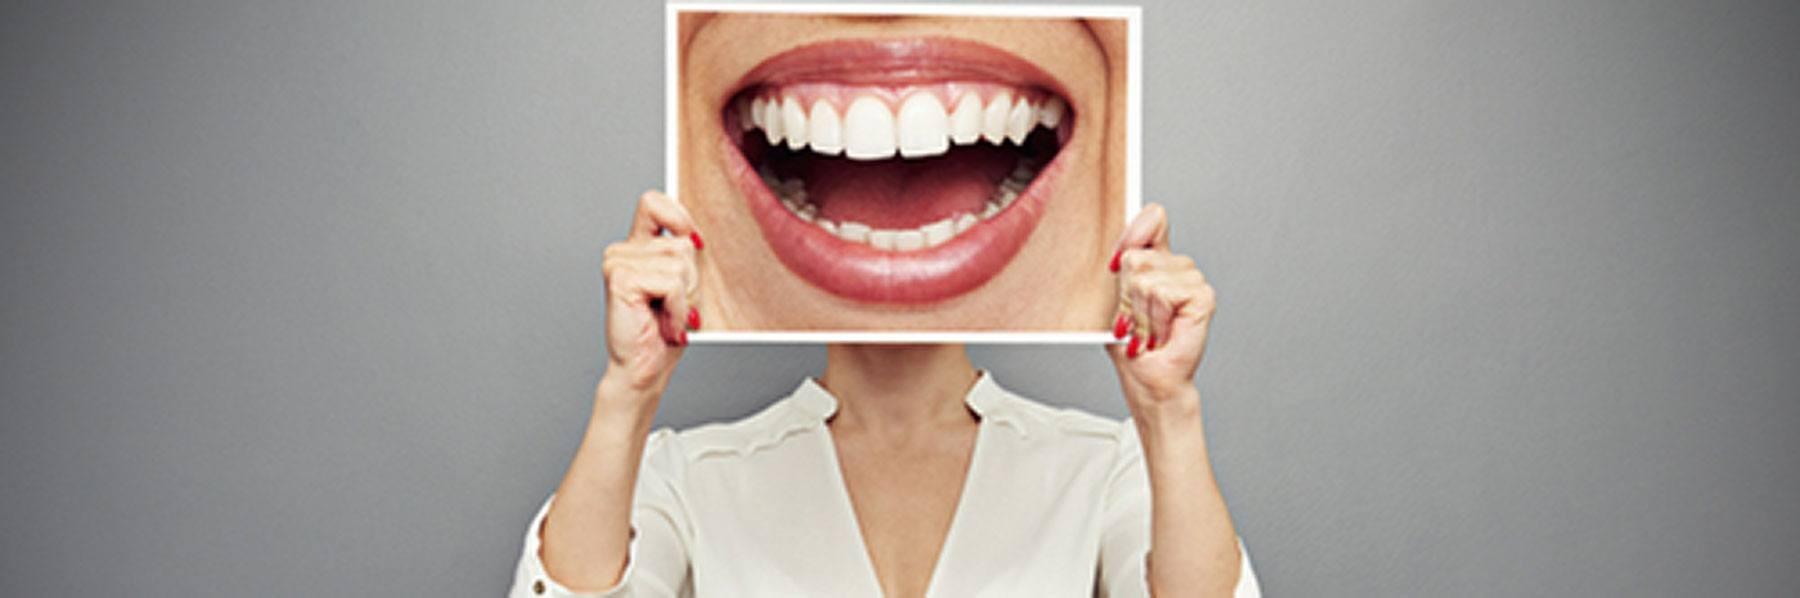 cosmetic-dentist